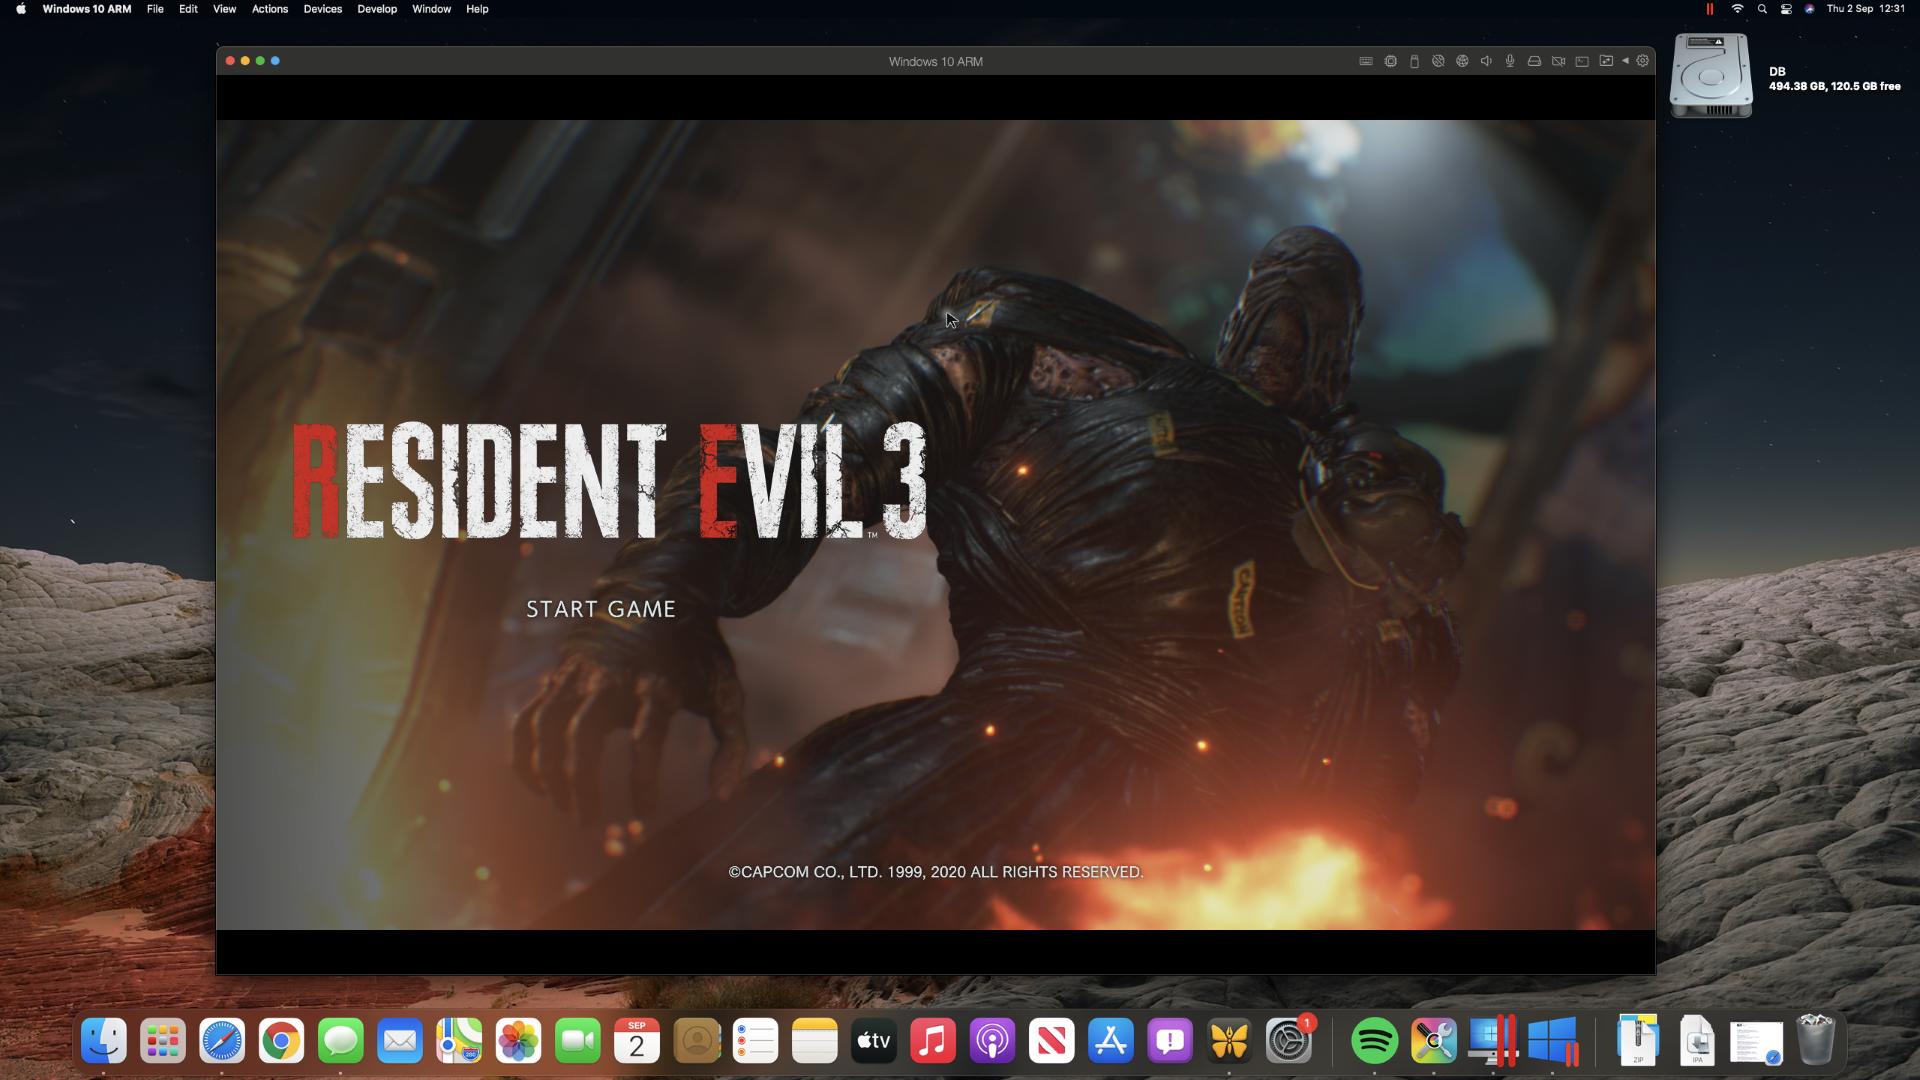 Resident Evil 3 Remake on an M1 Mac mini through Steam